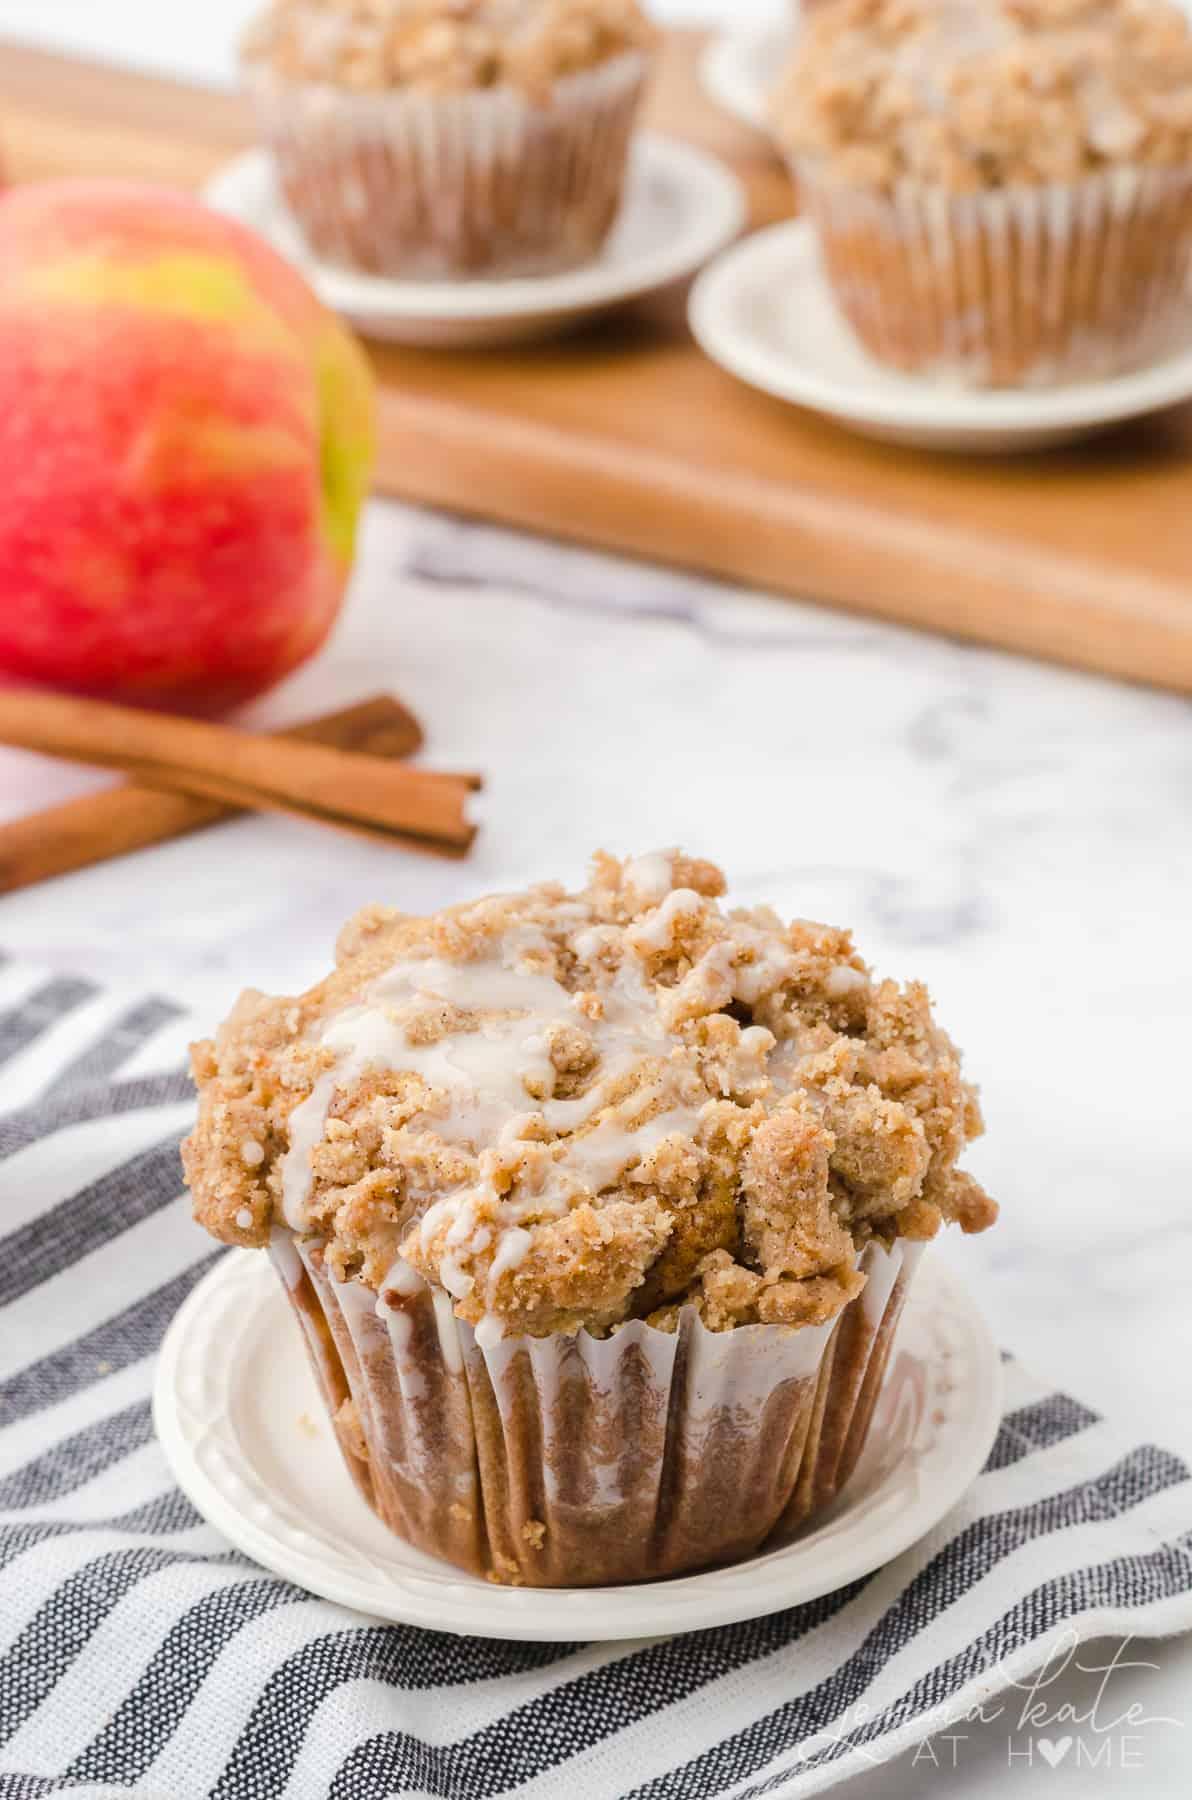 crumb topping on cinnamon apple muffin